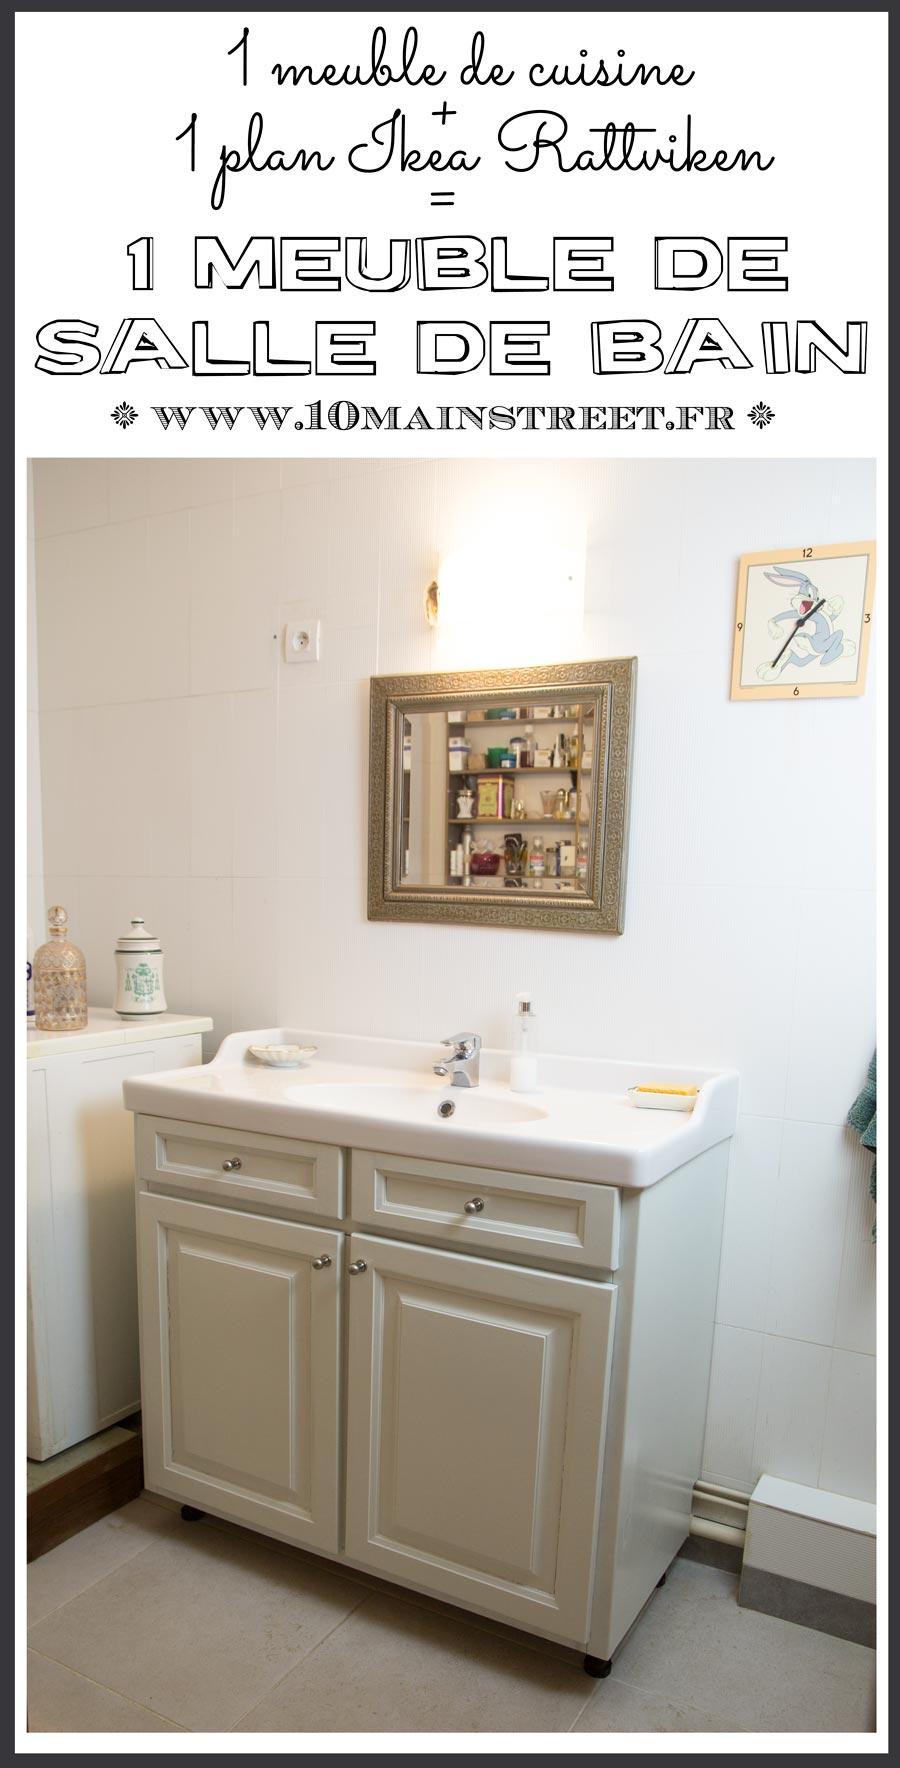 Un meuble de cuisine + un plan Ikea rattviken = un meuble de salle ...